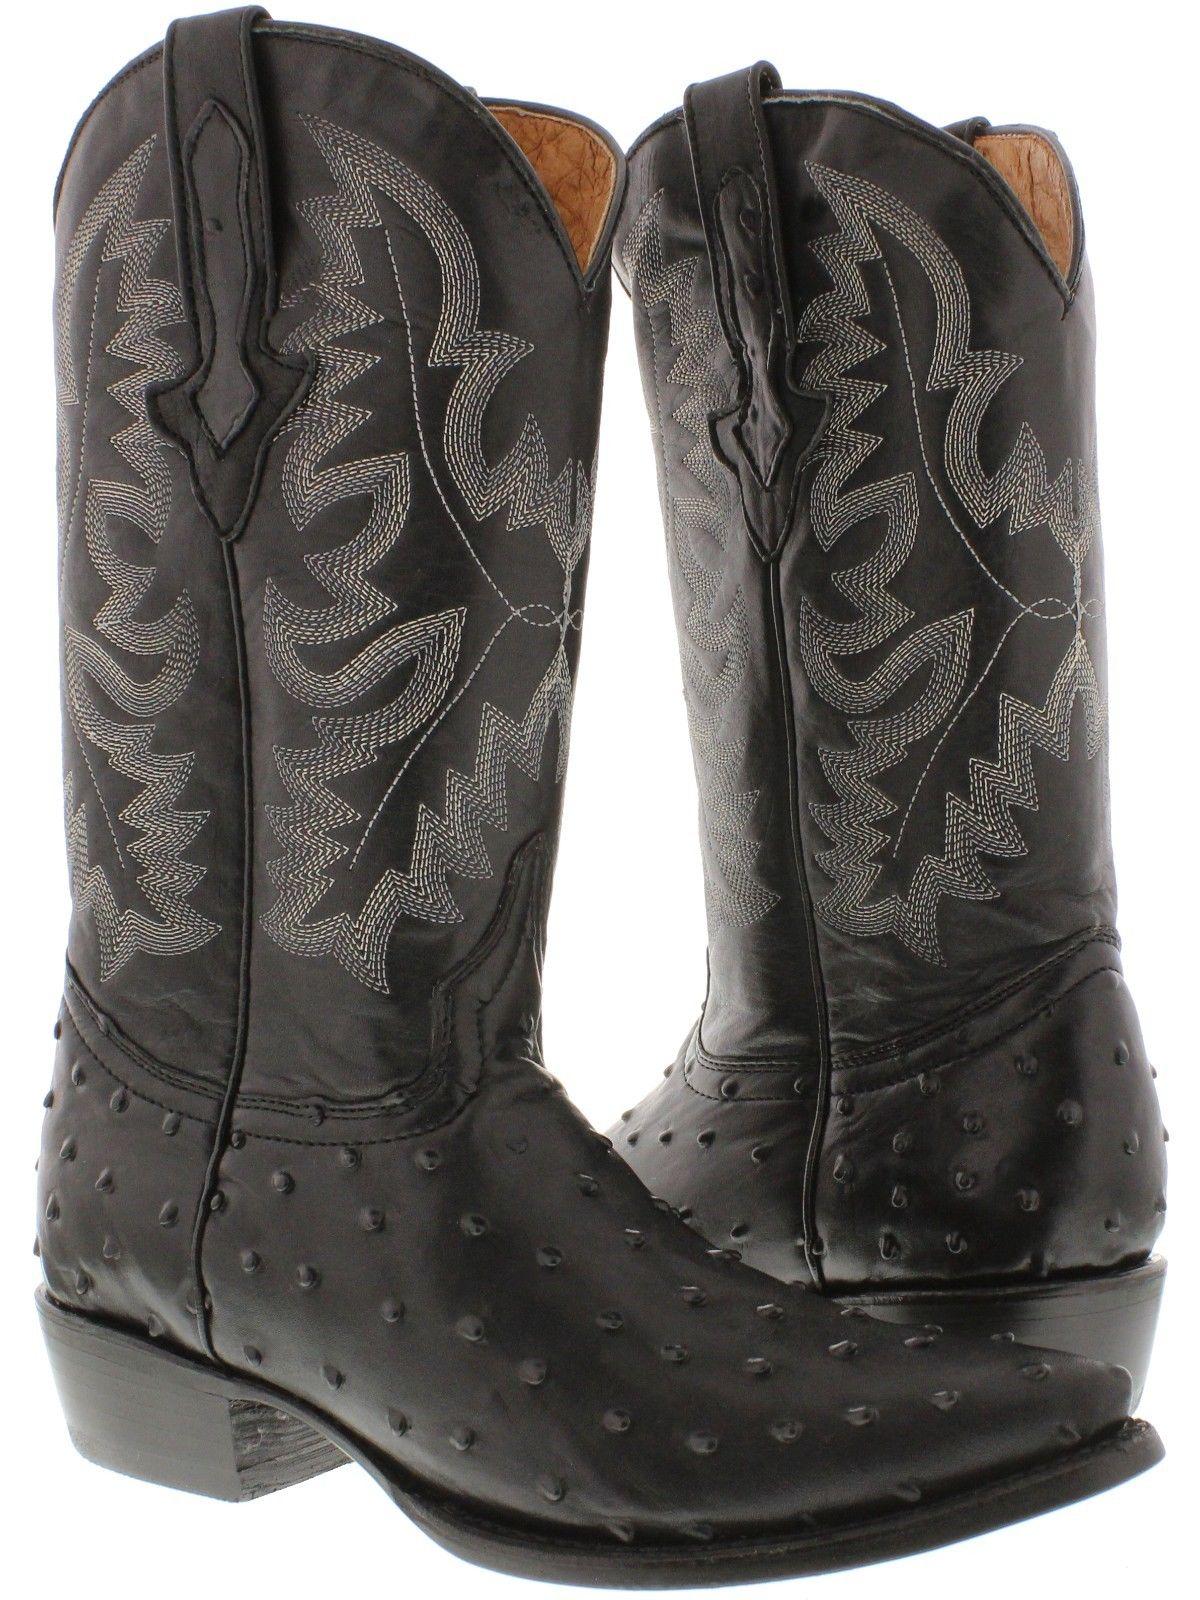 7fb754929f5 Mens Black Ostrich Quill Print Leather Cowboy Boots Western Wear ...